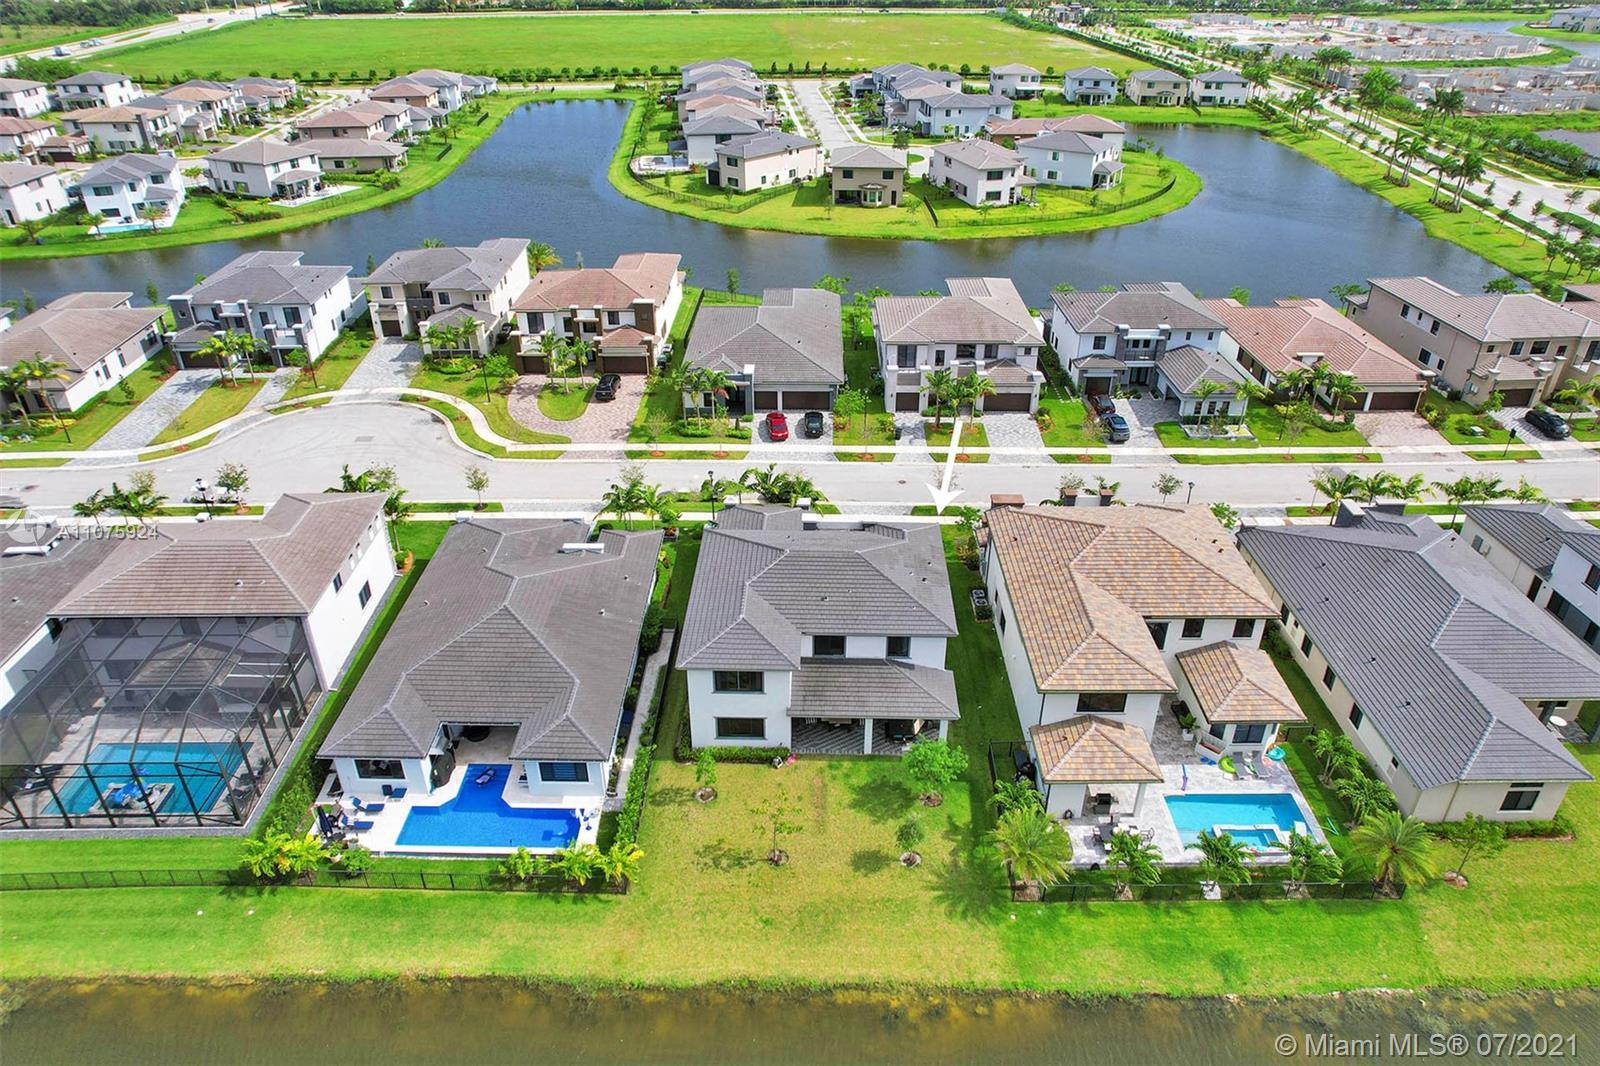 Photo of 10545 Mira Vista Dr, Home